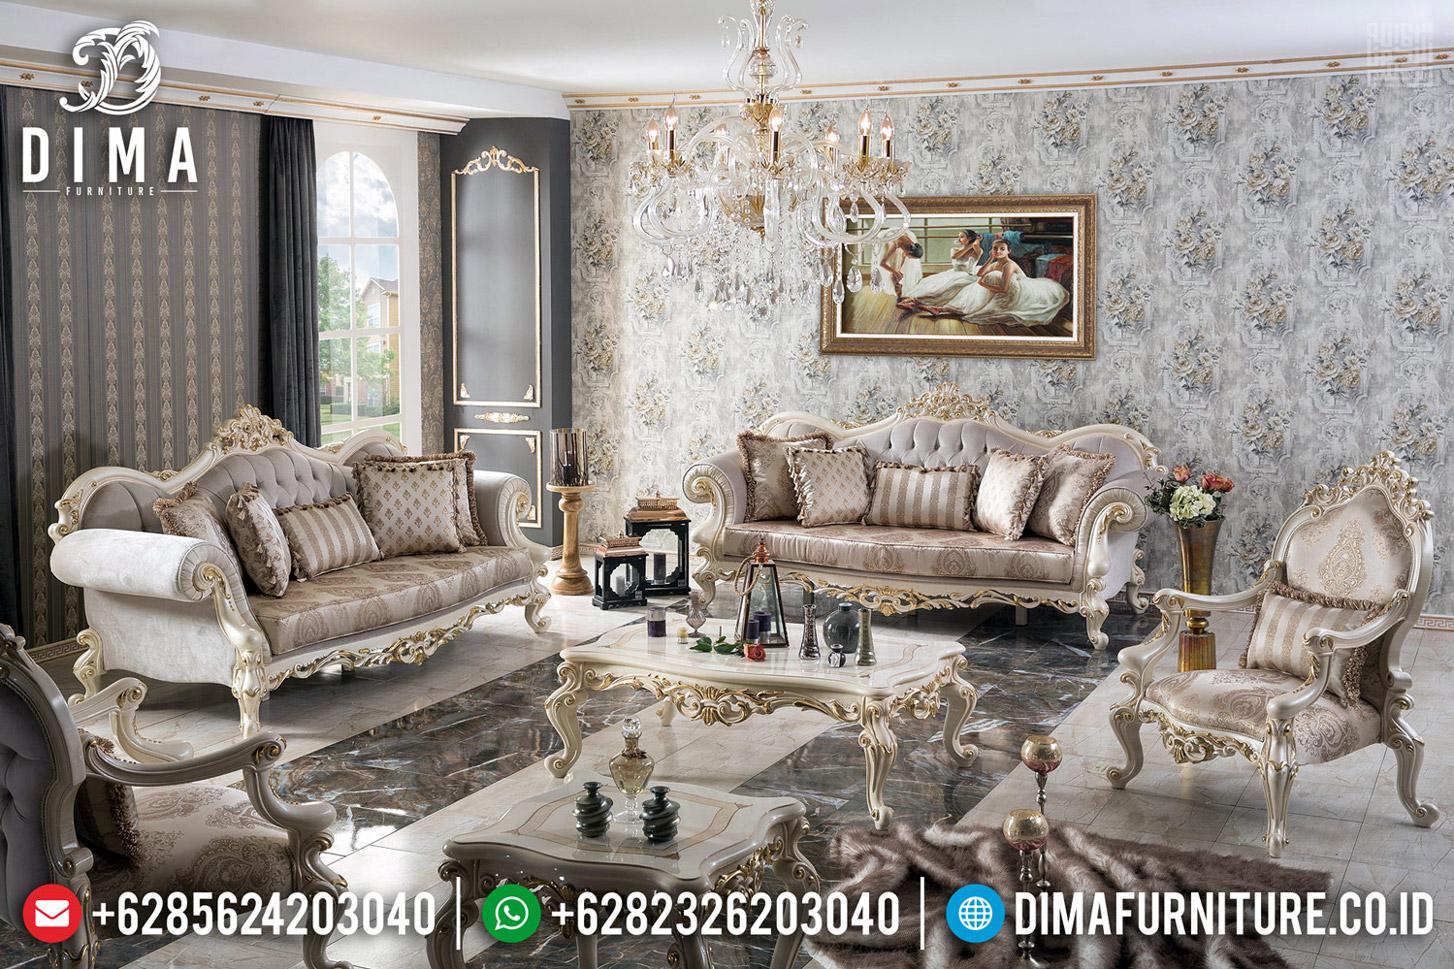 Interior Luxury Design Sofa Tamu Mewah Jepara New Realease MMJ-0592